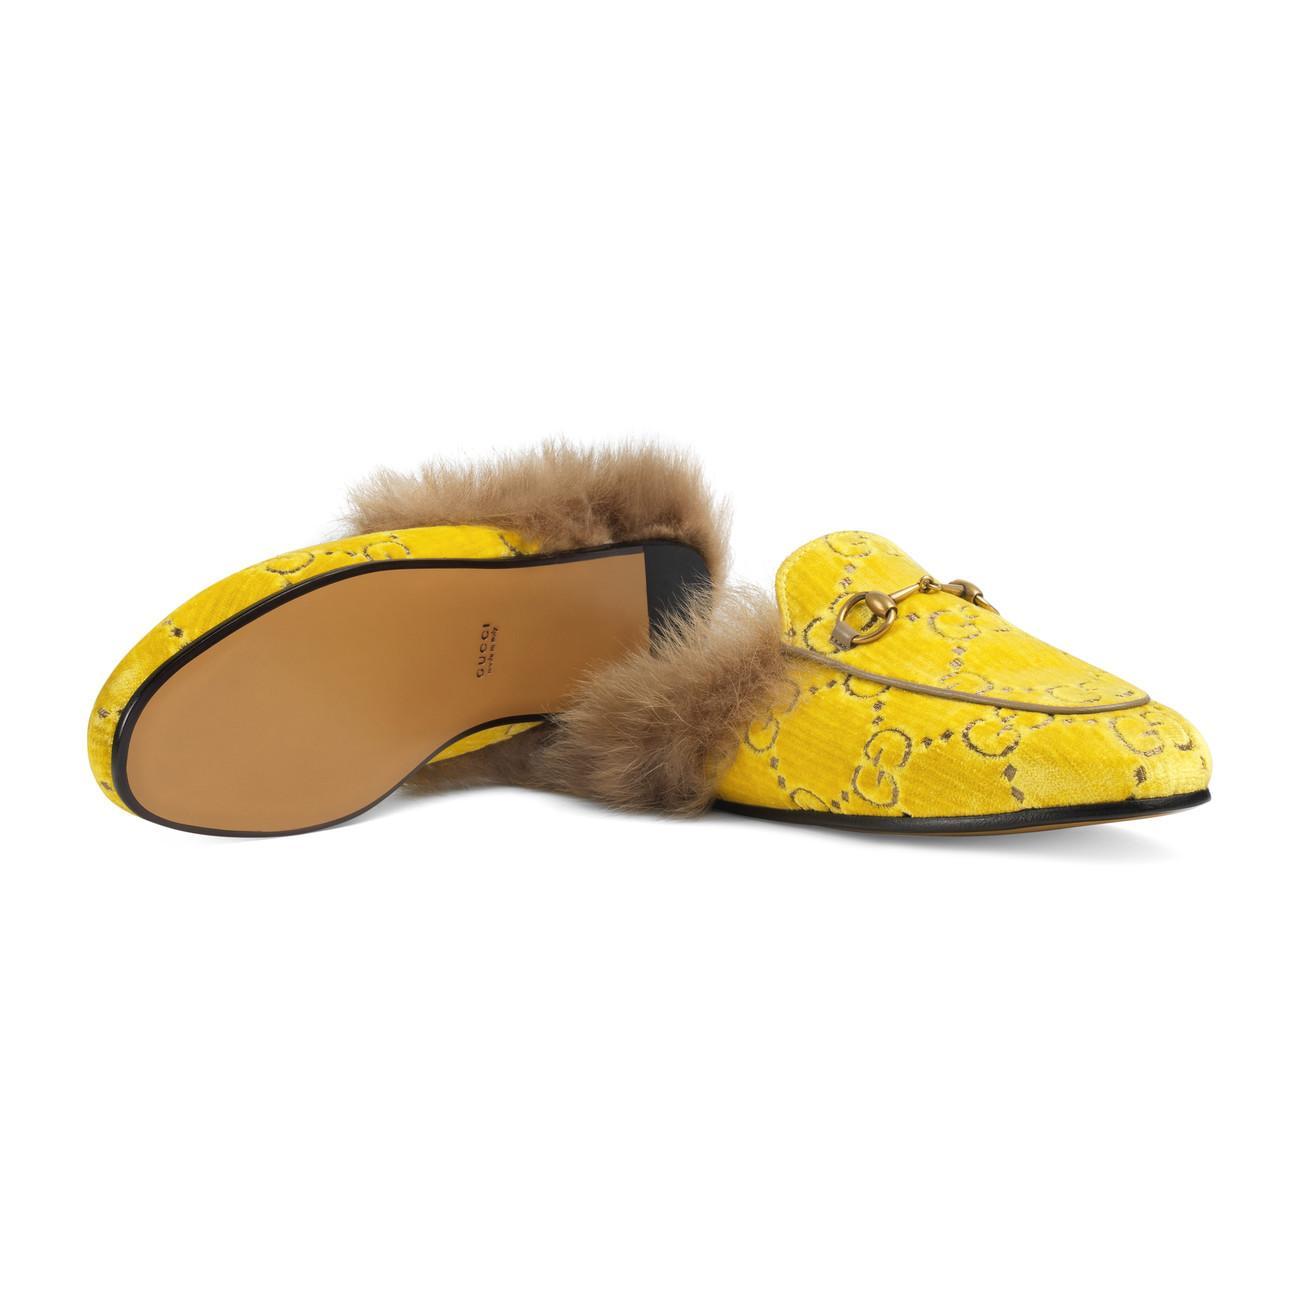 780e7cdf269 Lyst - Gucci Princetown GG Velvet Slipper in Yellow